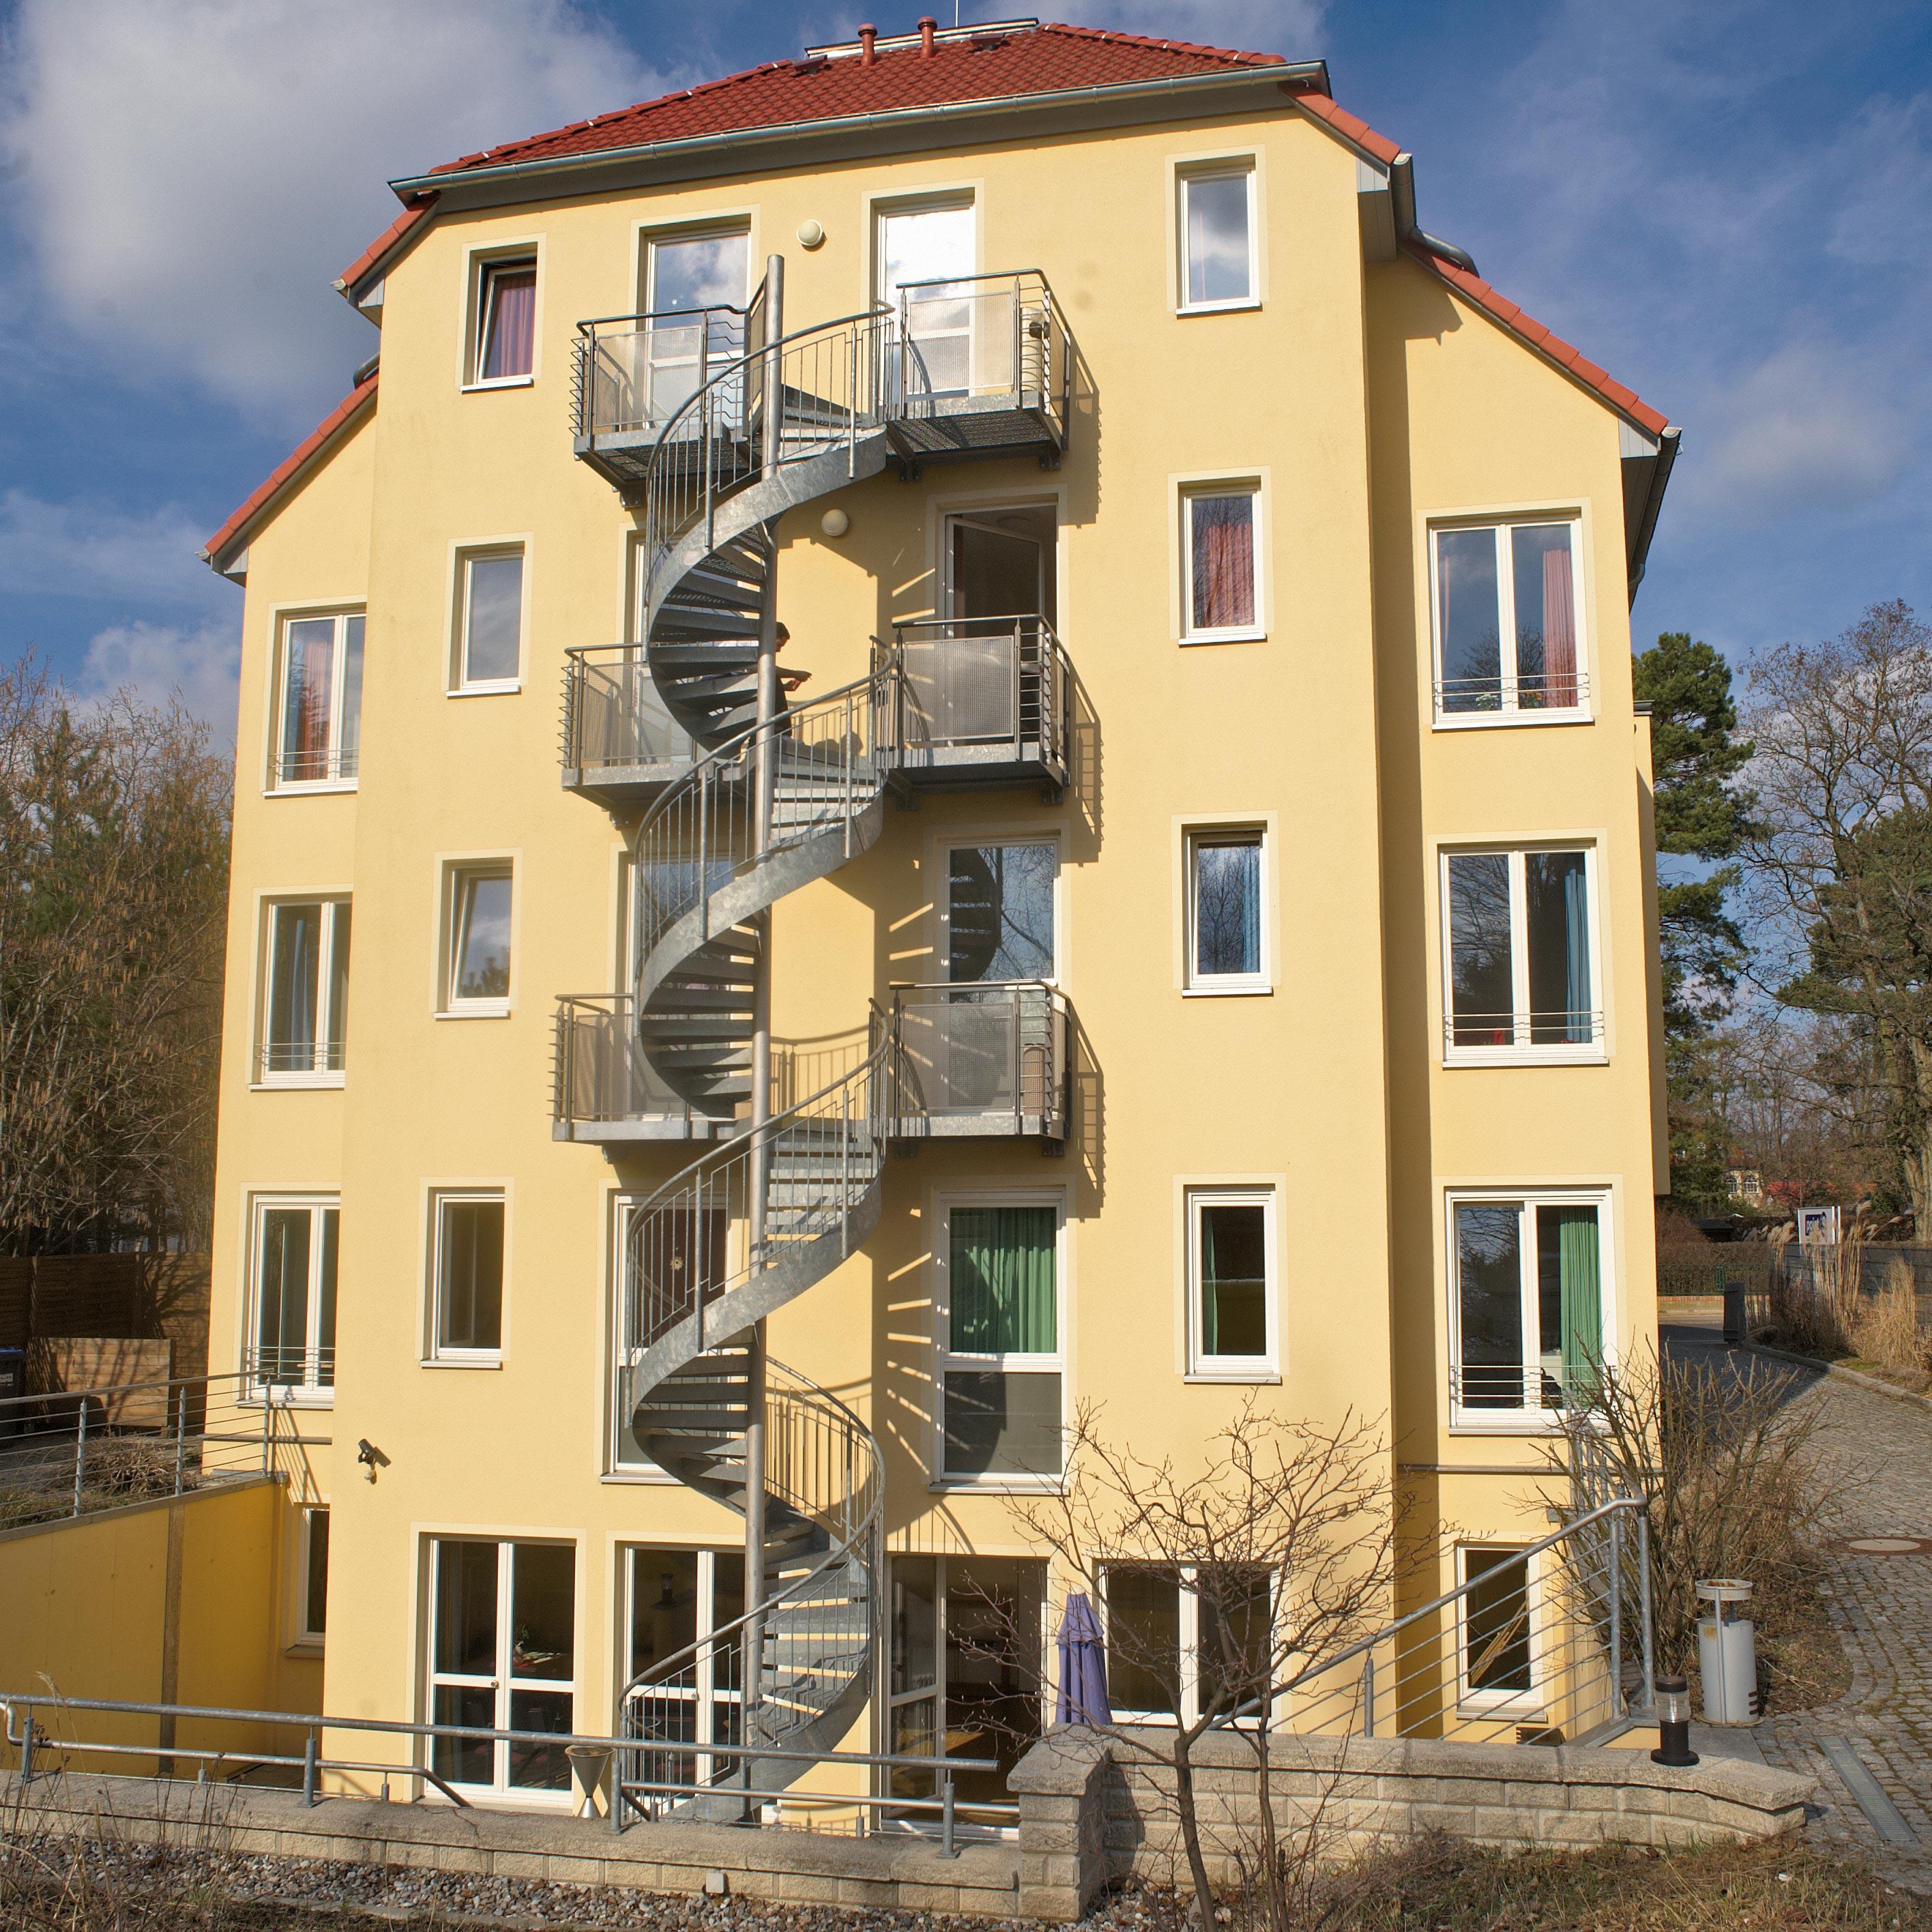 Adaptionshaus Birkenwerder